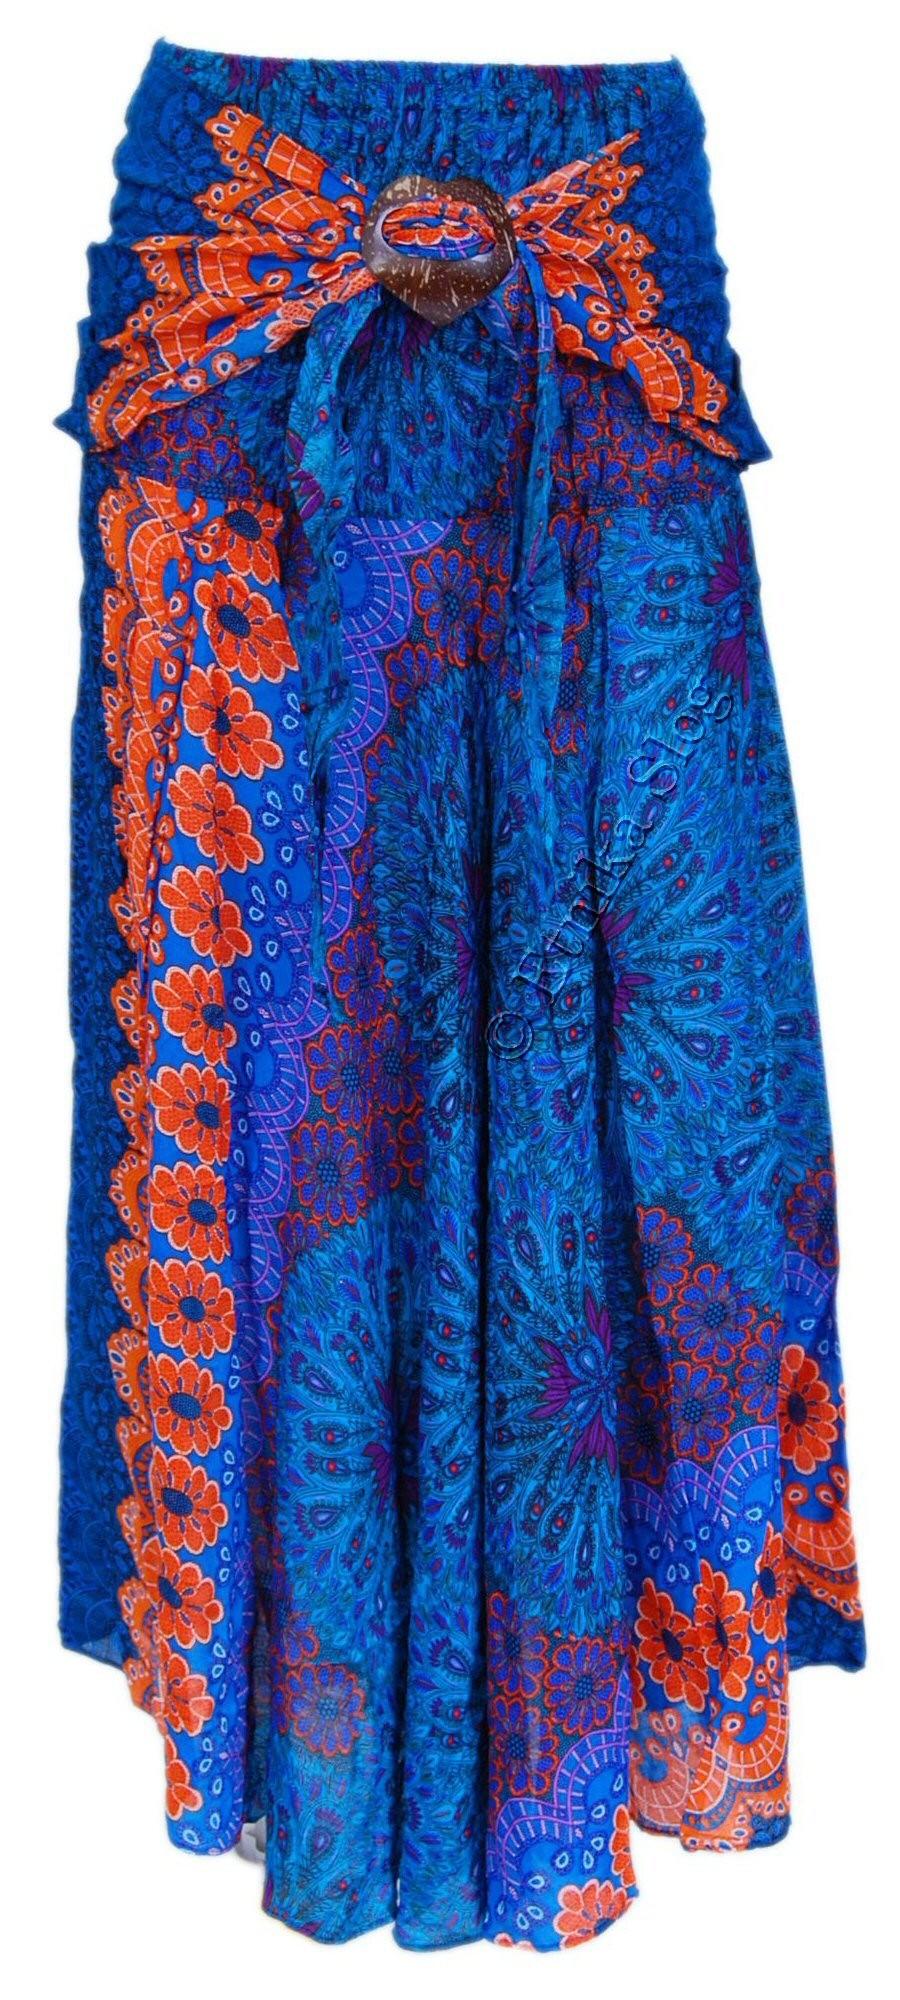 VISCOSE - SUMMER CLOTHING AB-BCK04AC - Oriente Import S.r.l.